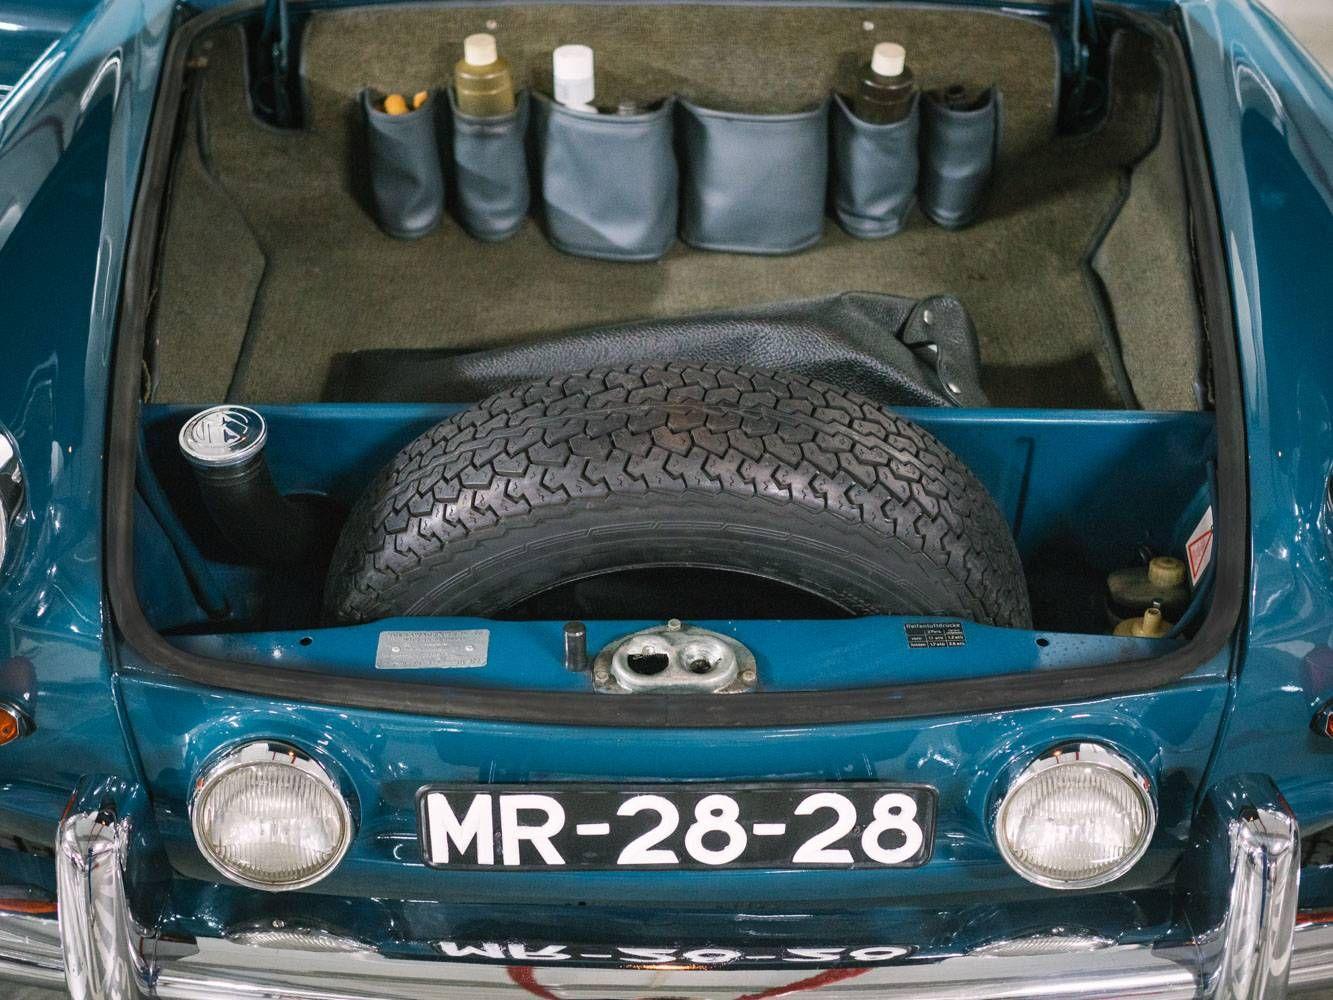 VW 1500 S Variant - | Volkswagen Classic | Pinterest | Vw ...